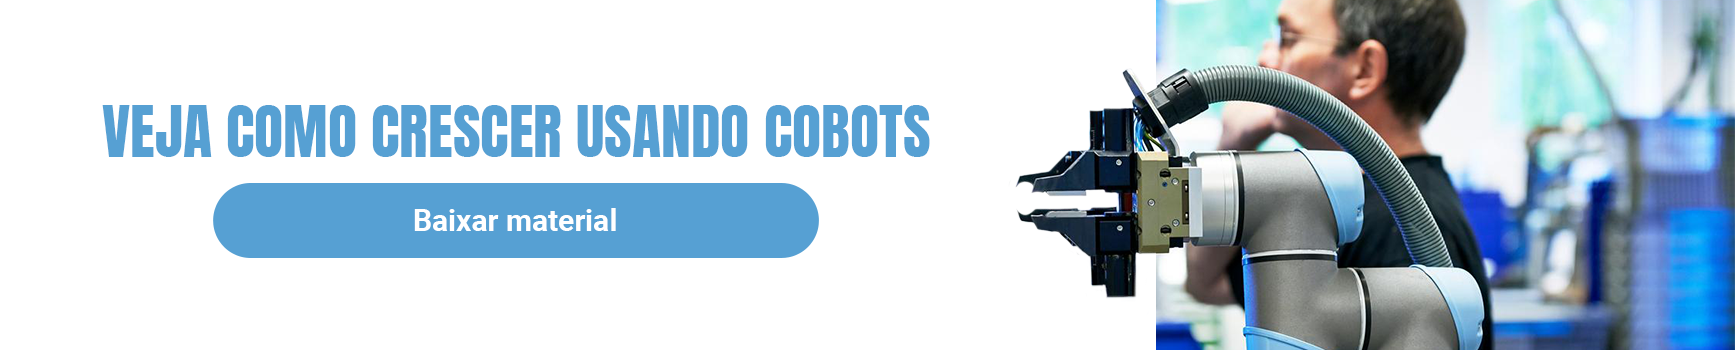 Ebook Universal Robots